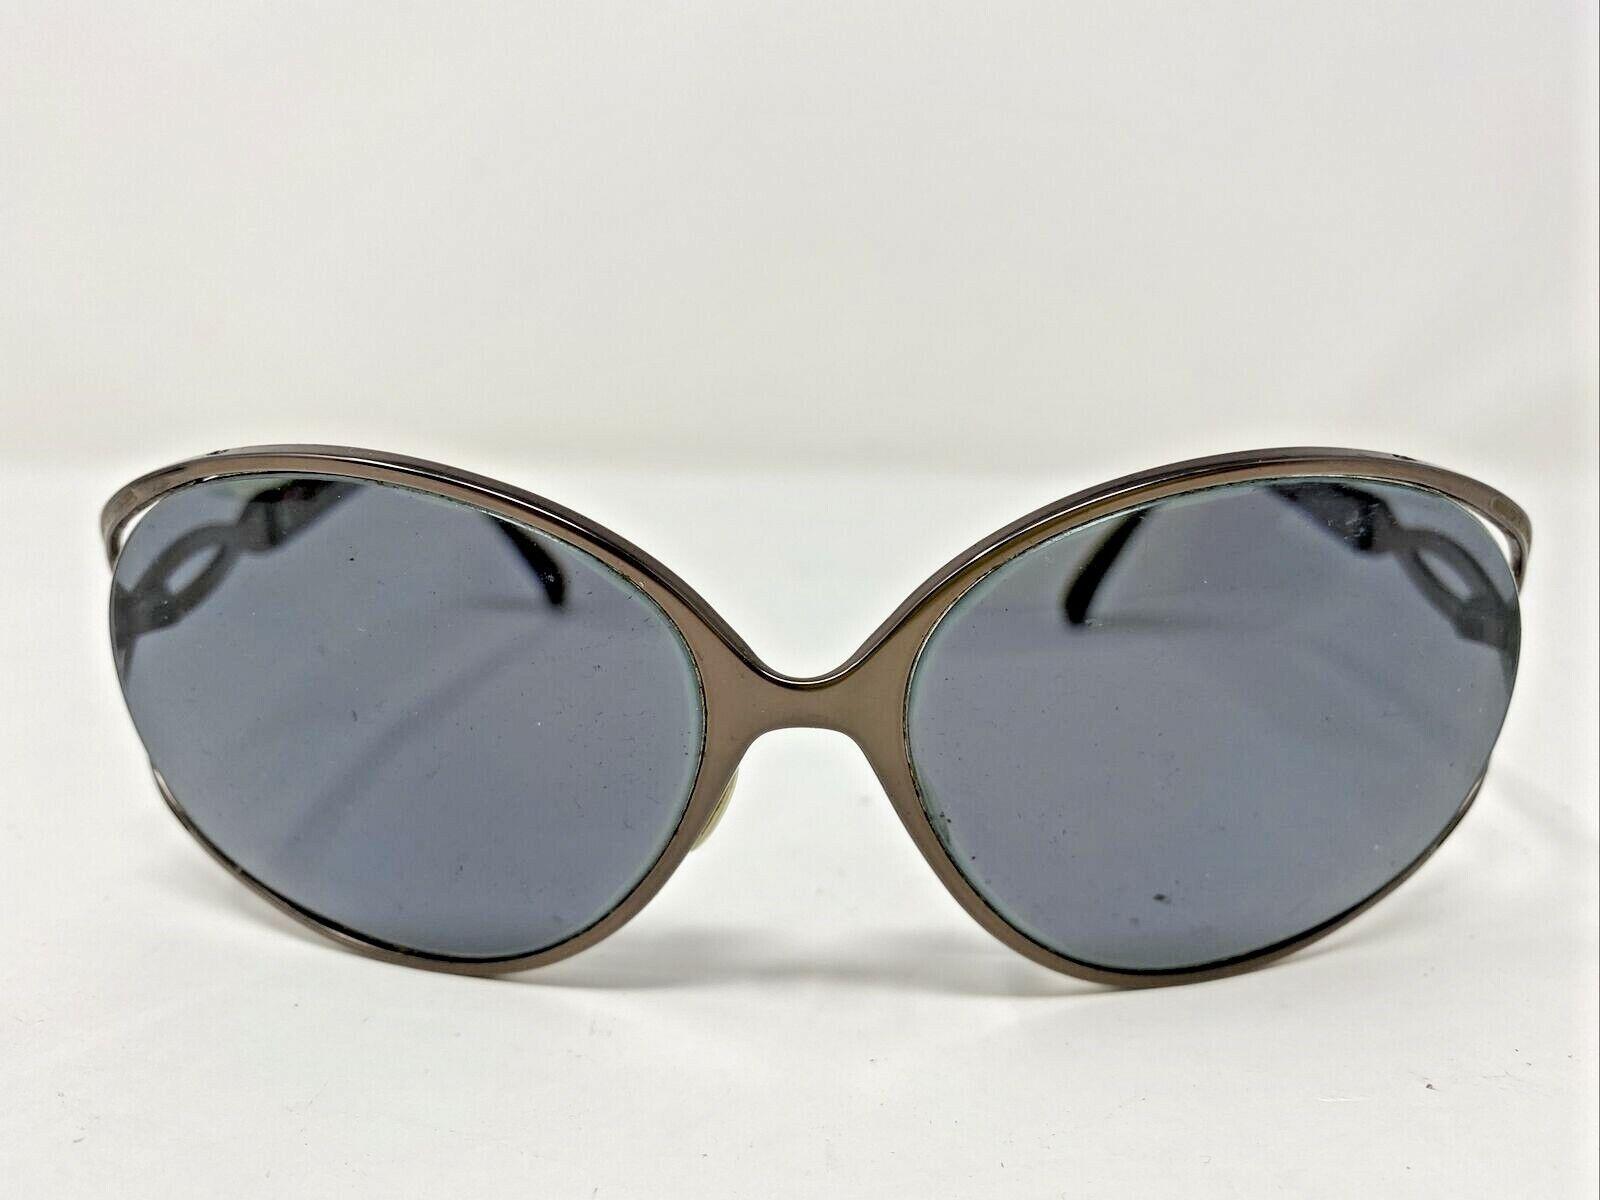 Christian Roth Sunglasses Frame CR14299 BR 60-16-120 Brown Full Rim RS54